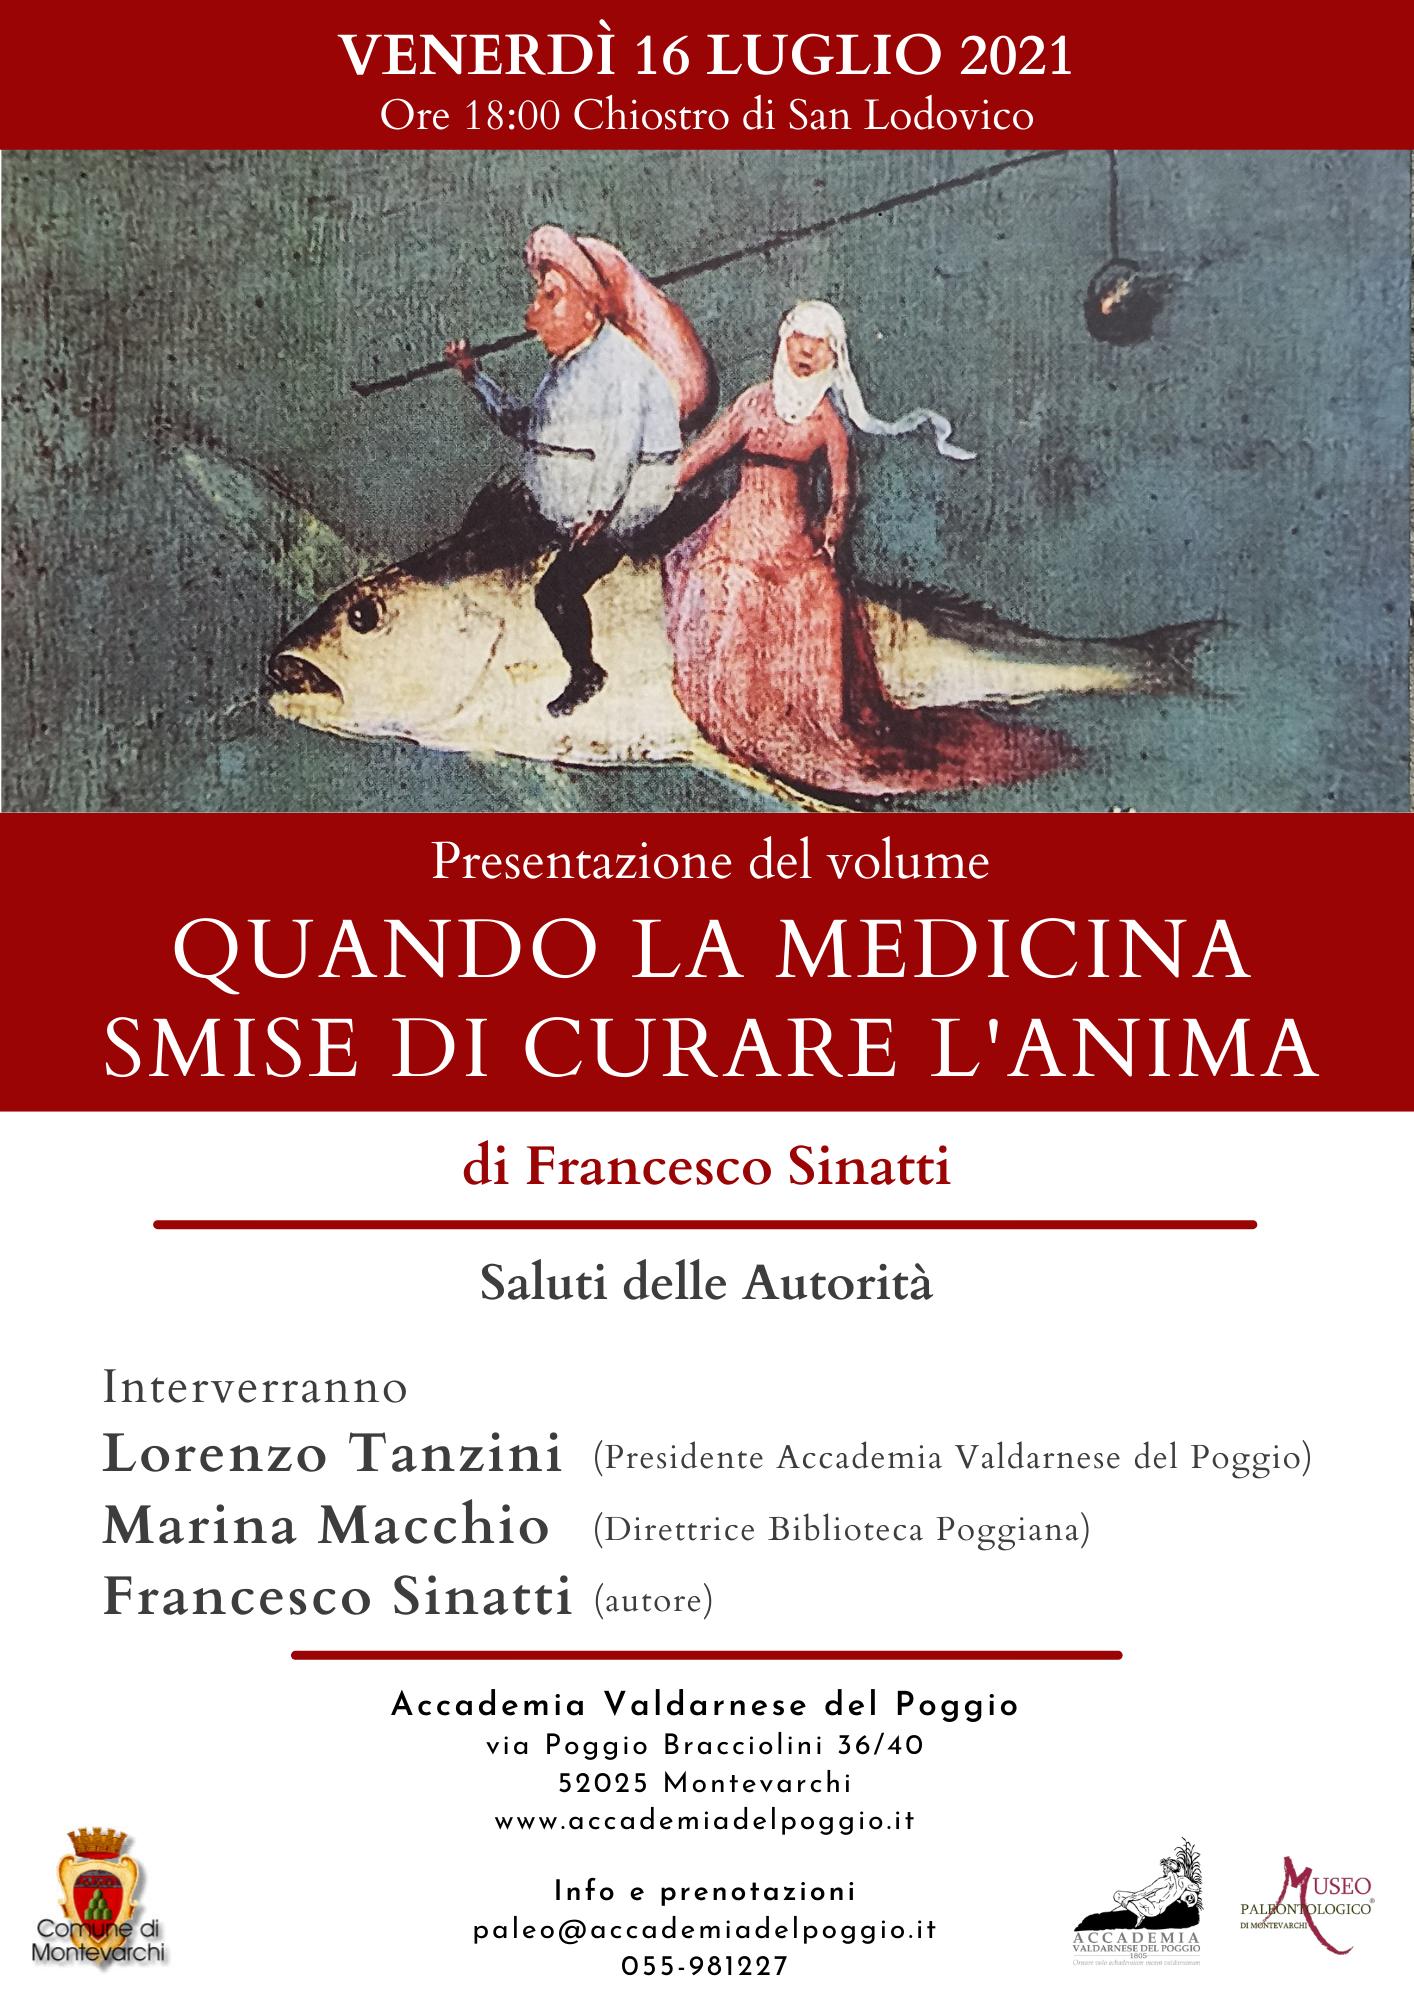 Francesco Sinatti